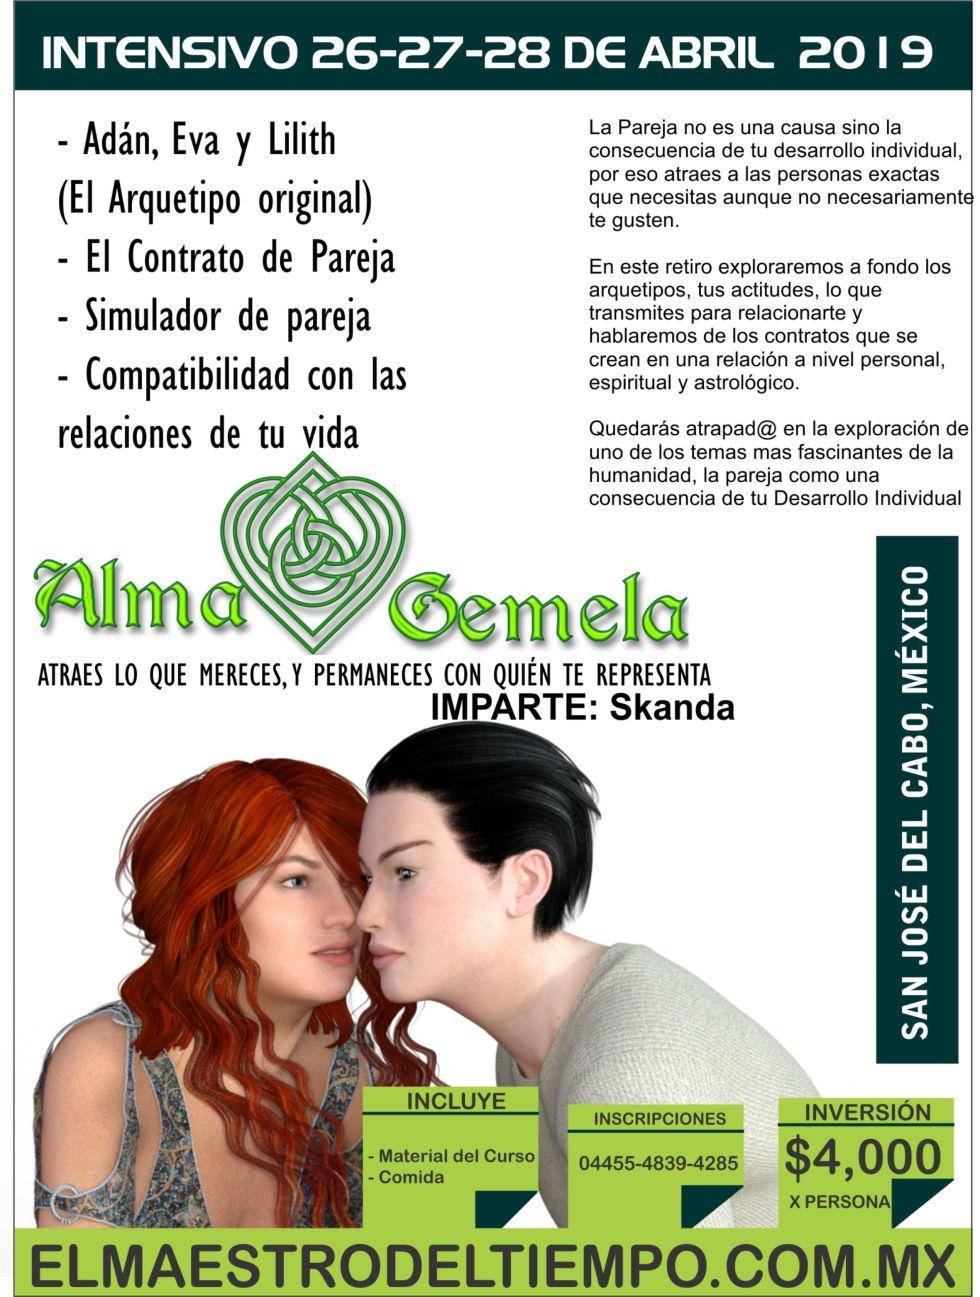 ALMAGEMELA